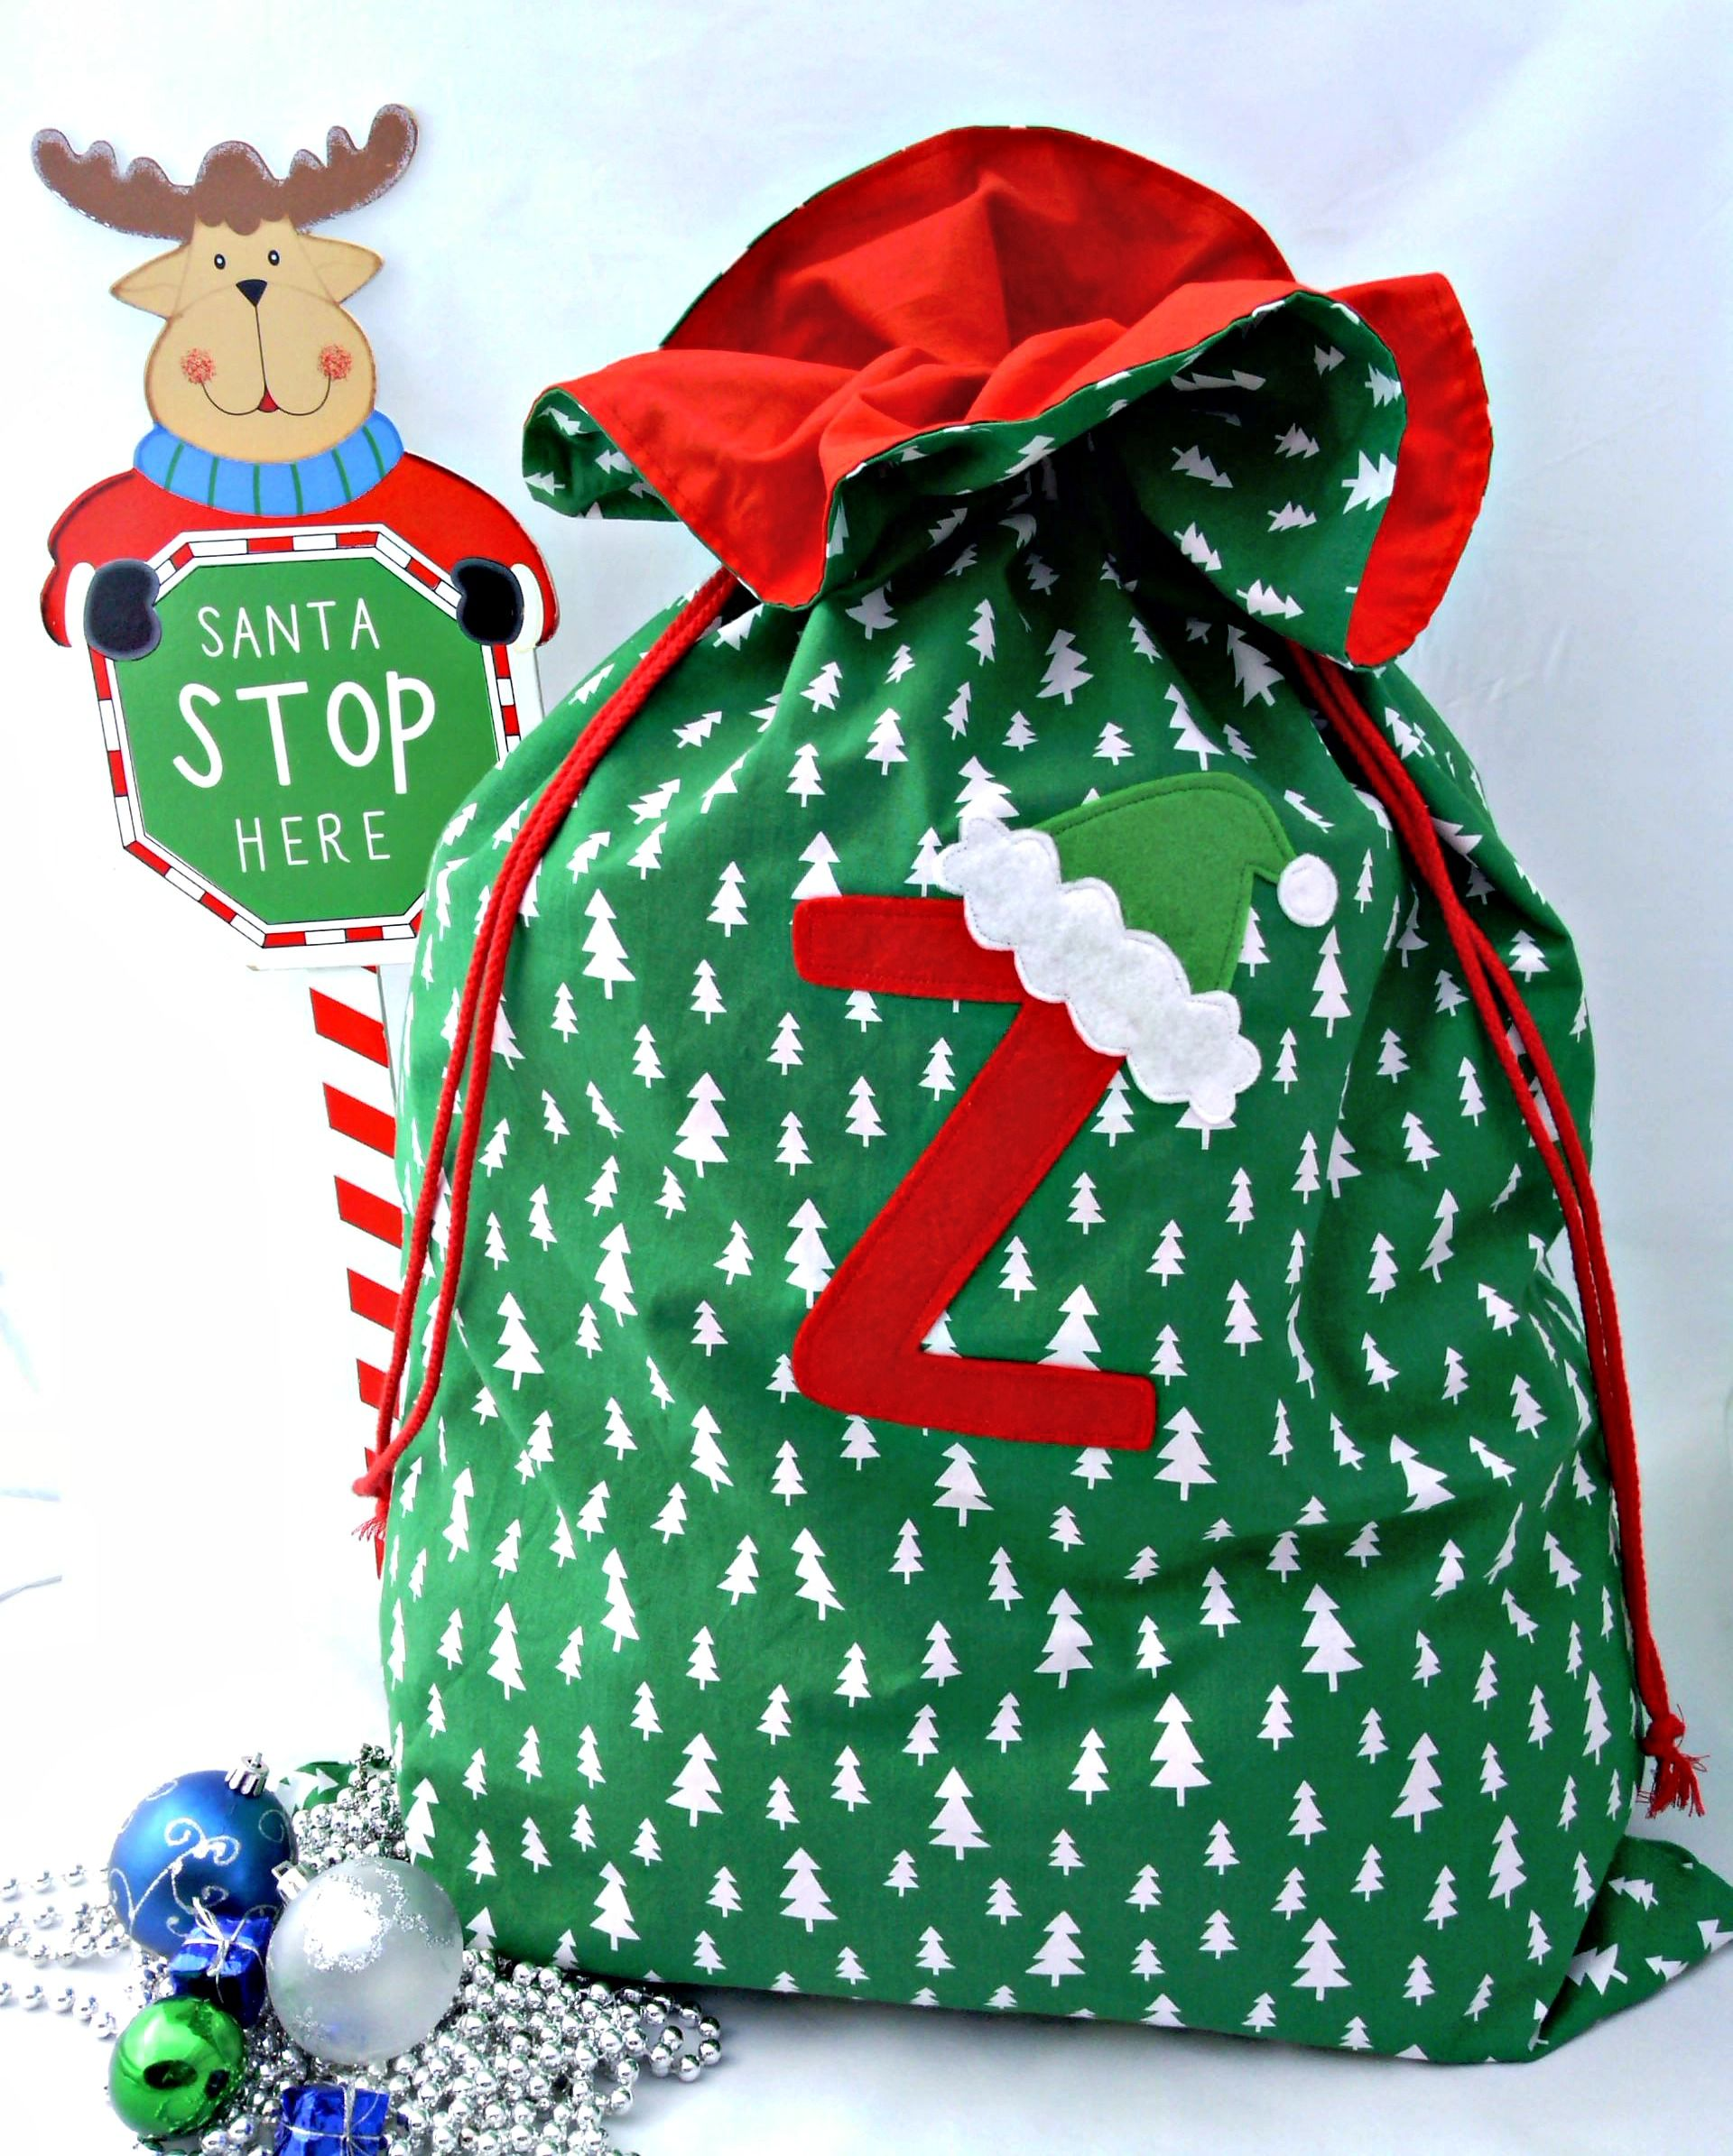 Personalised Nose Reindeer Green Christmas Present Santa Sack Mail Post Bag